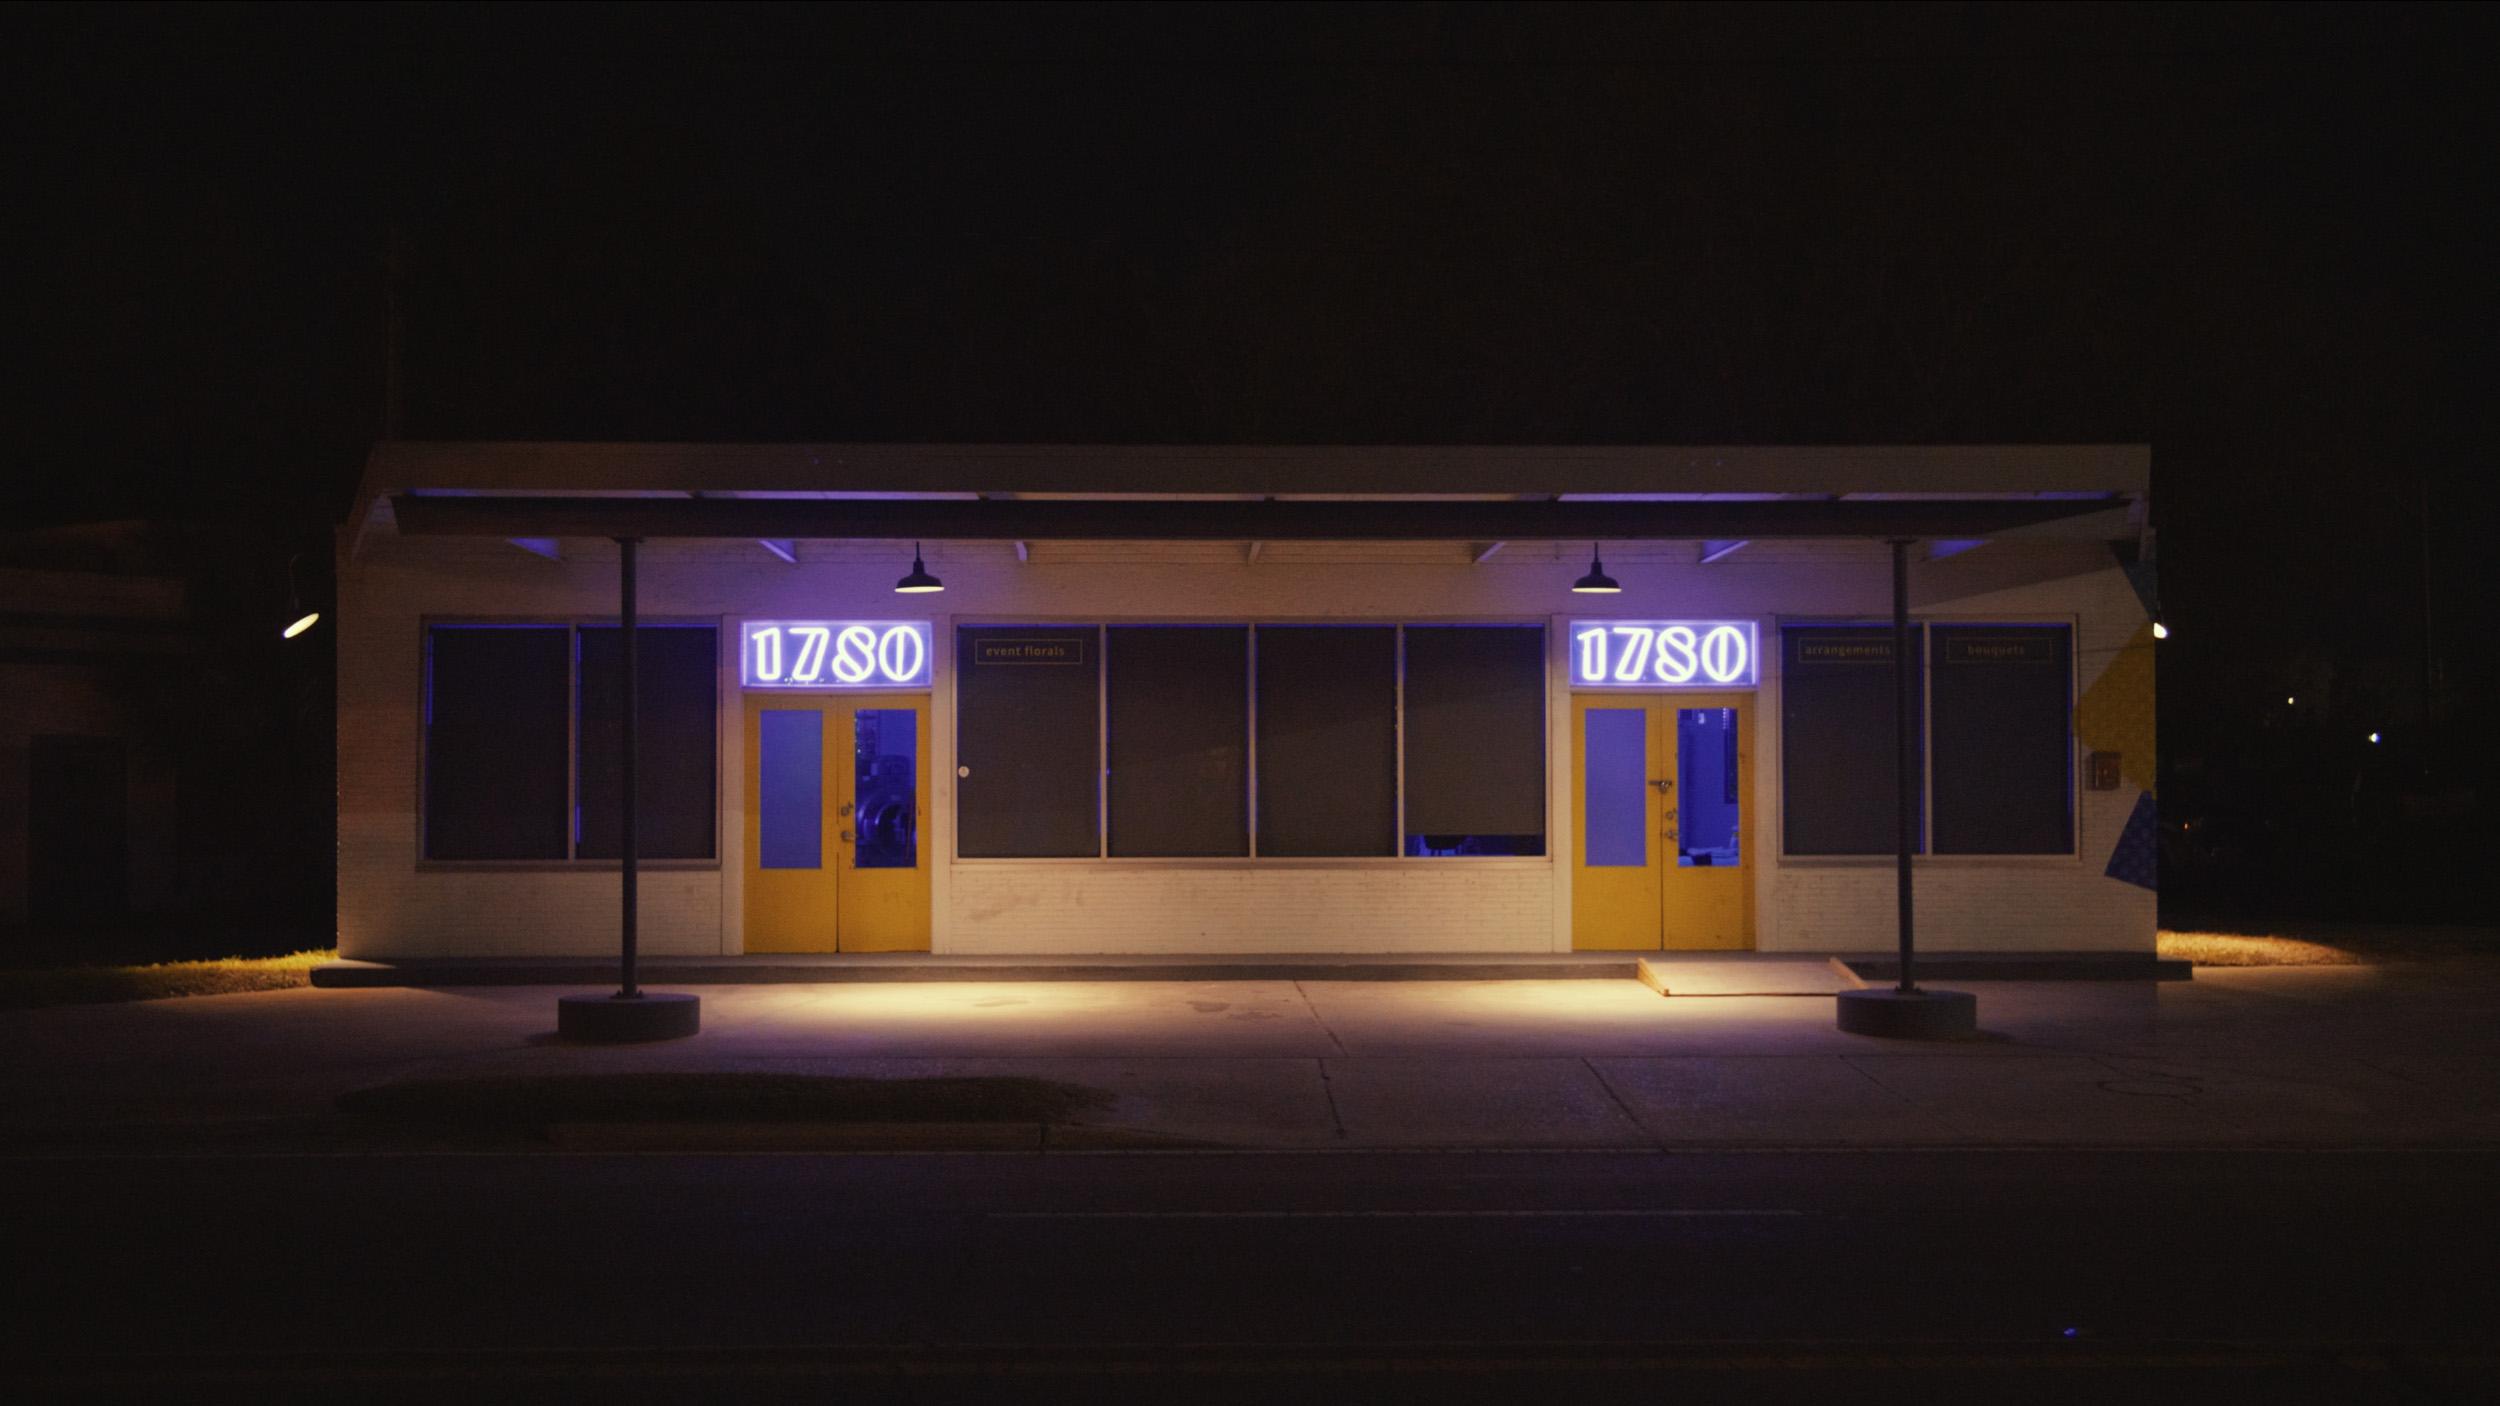 florida lights by jevgenij tichonov.jpg